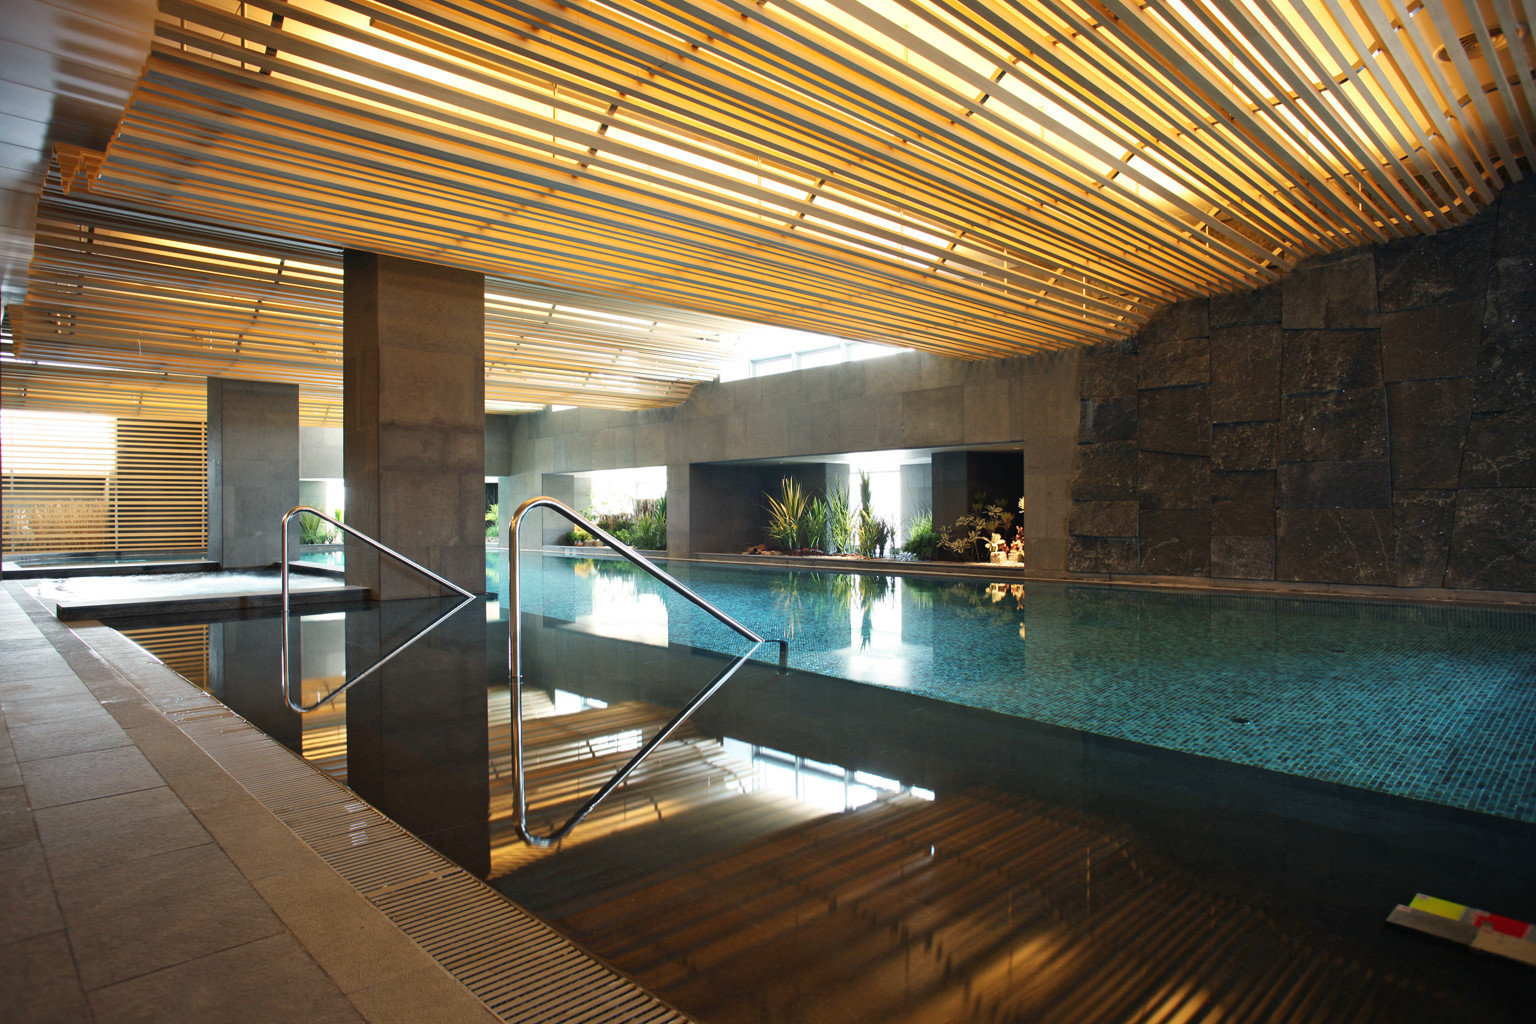 Fitness Luxury Modern Pool building swimming pool platform Architecture subway walkway